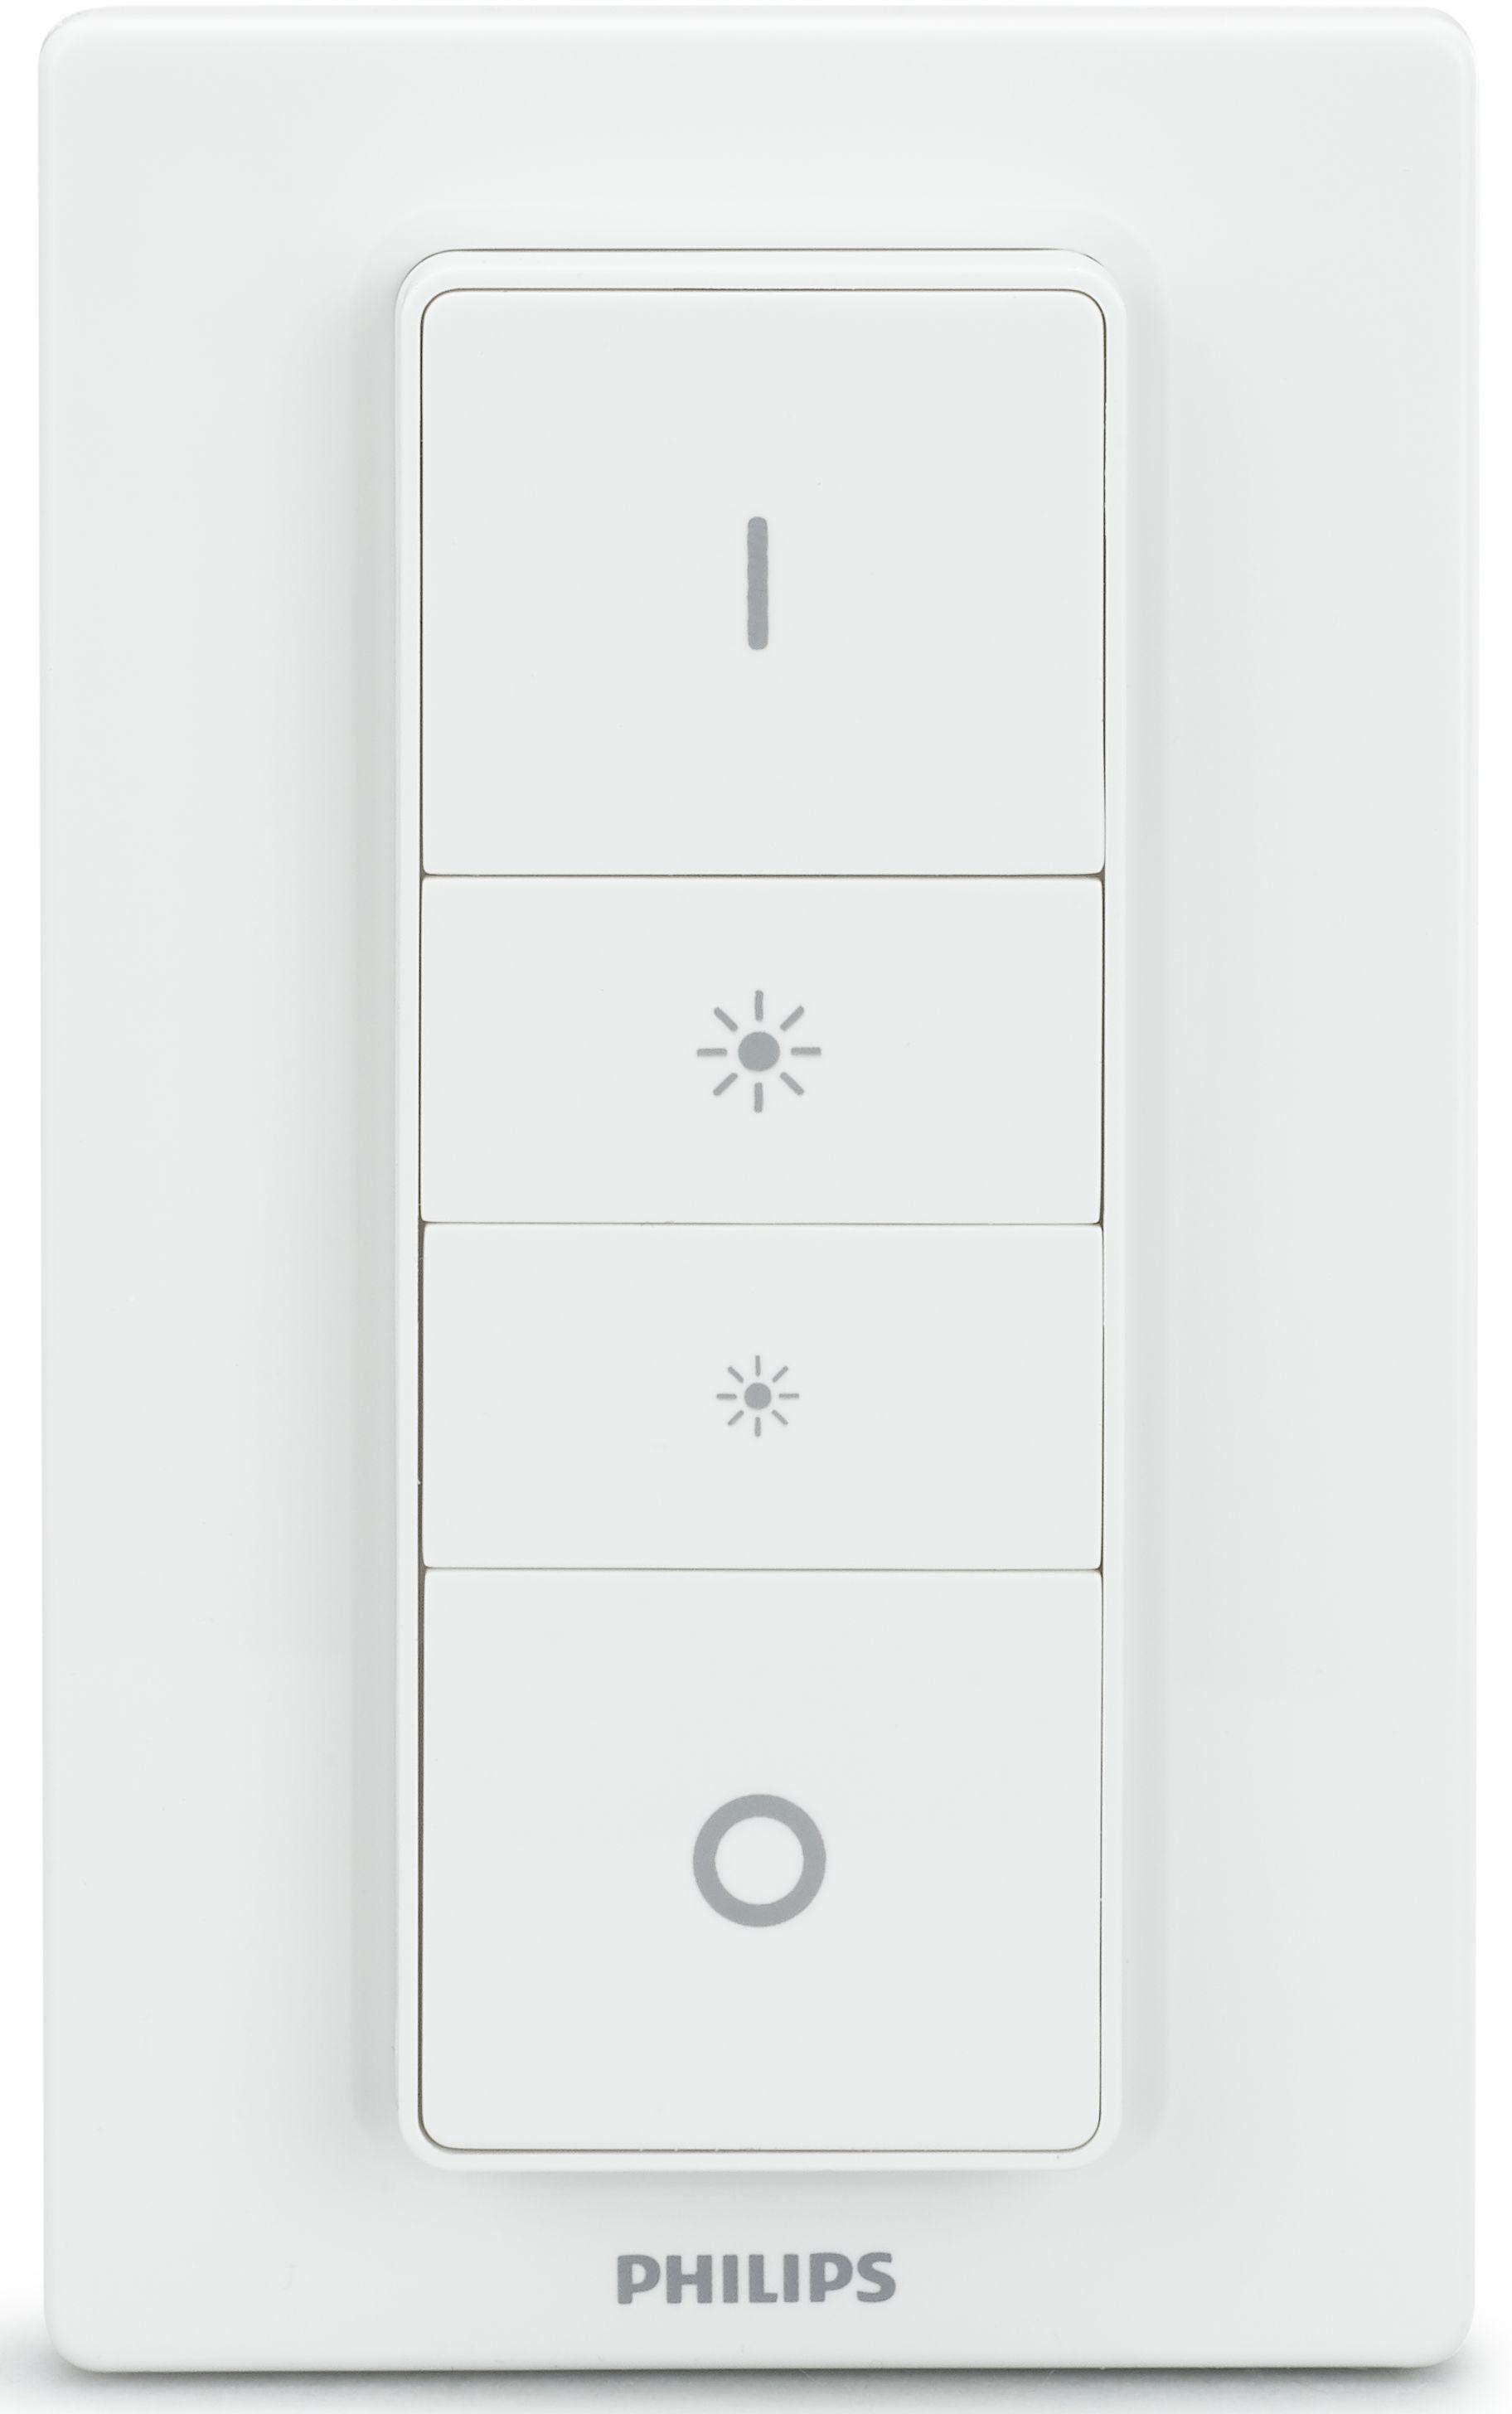 Philips Hue Dimmschalter, komf. Dimmen o. Installation - smartes LED-Lichtsystem, App-Steuerung